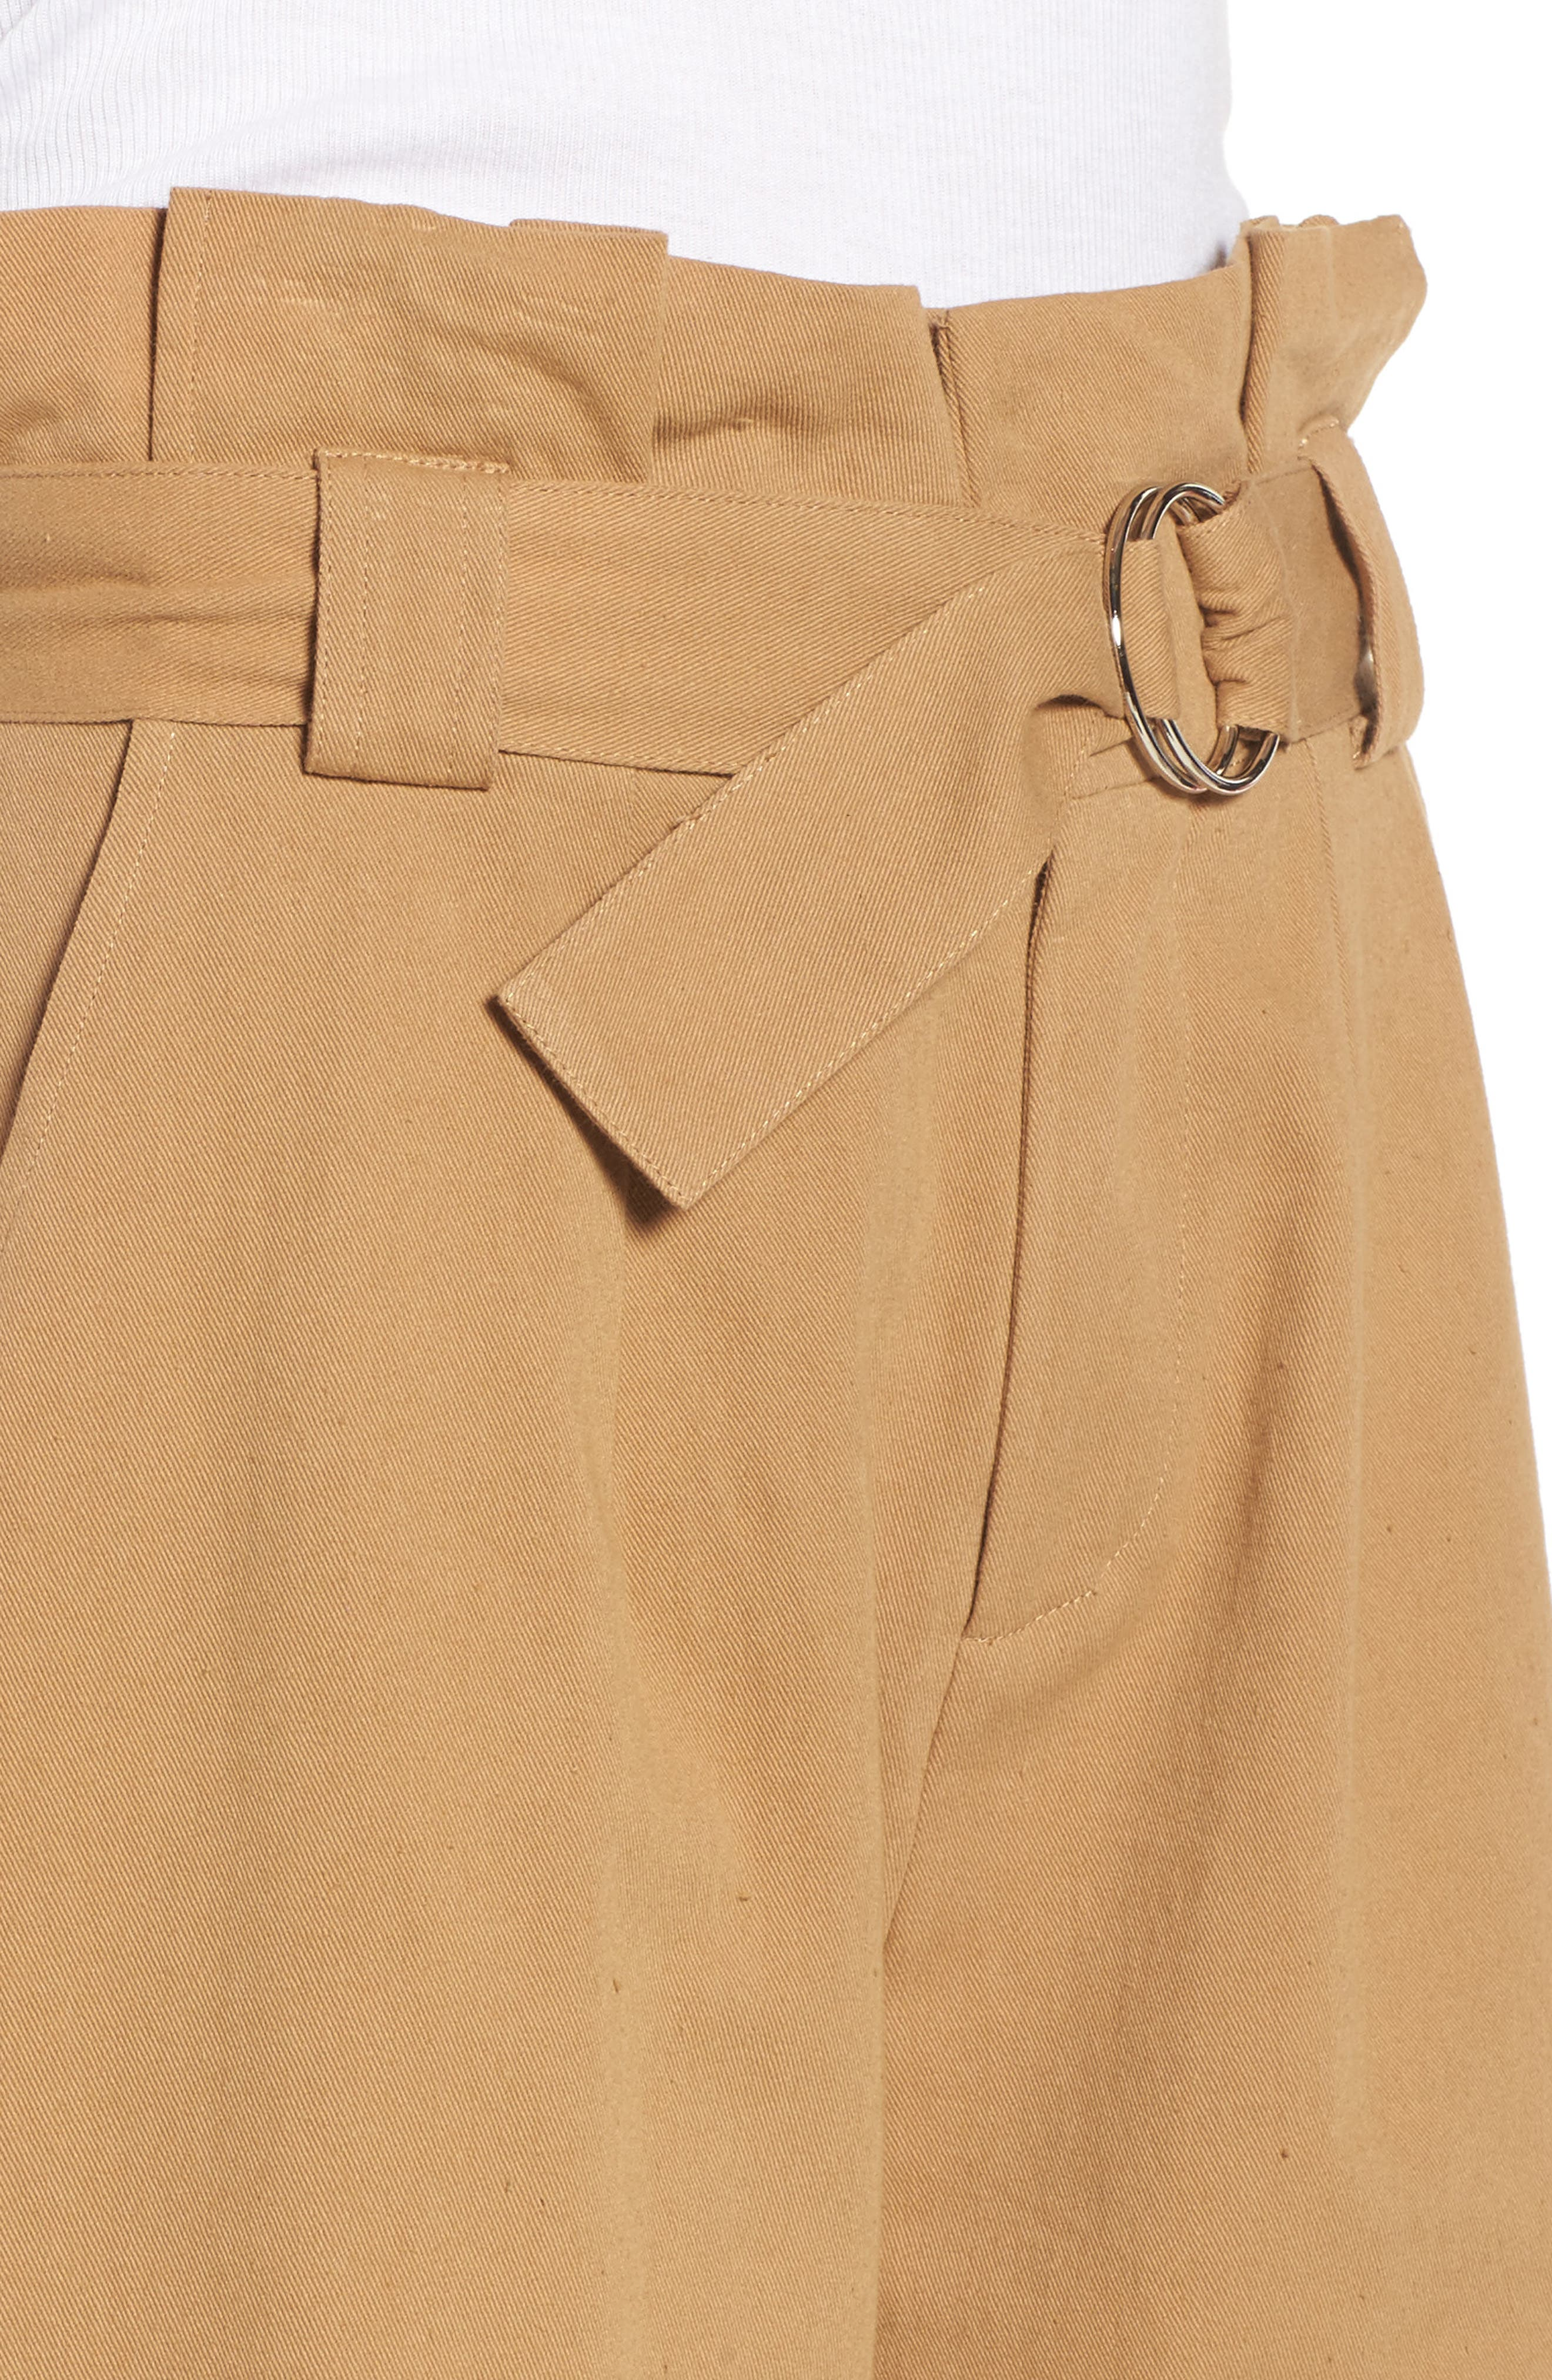 Paperbag Waist Crop Pants,                             Alternate thumbnail 4, color,                             Khaki